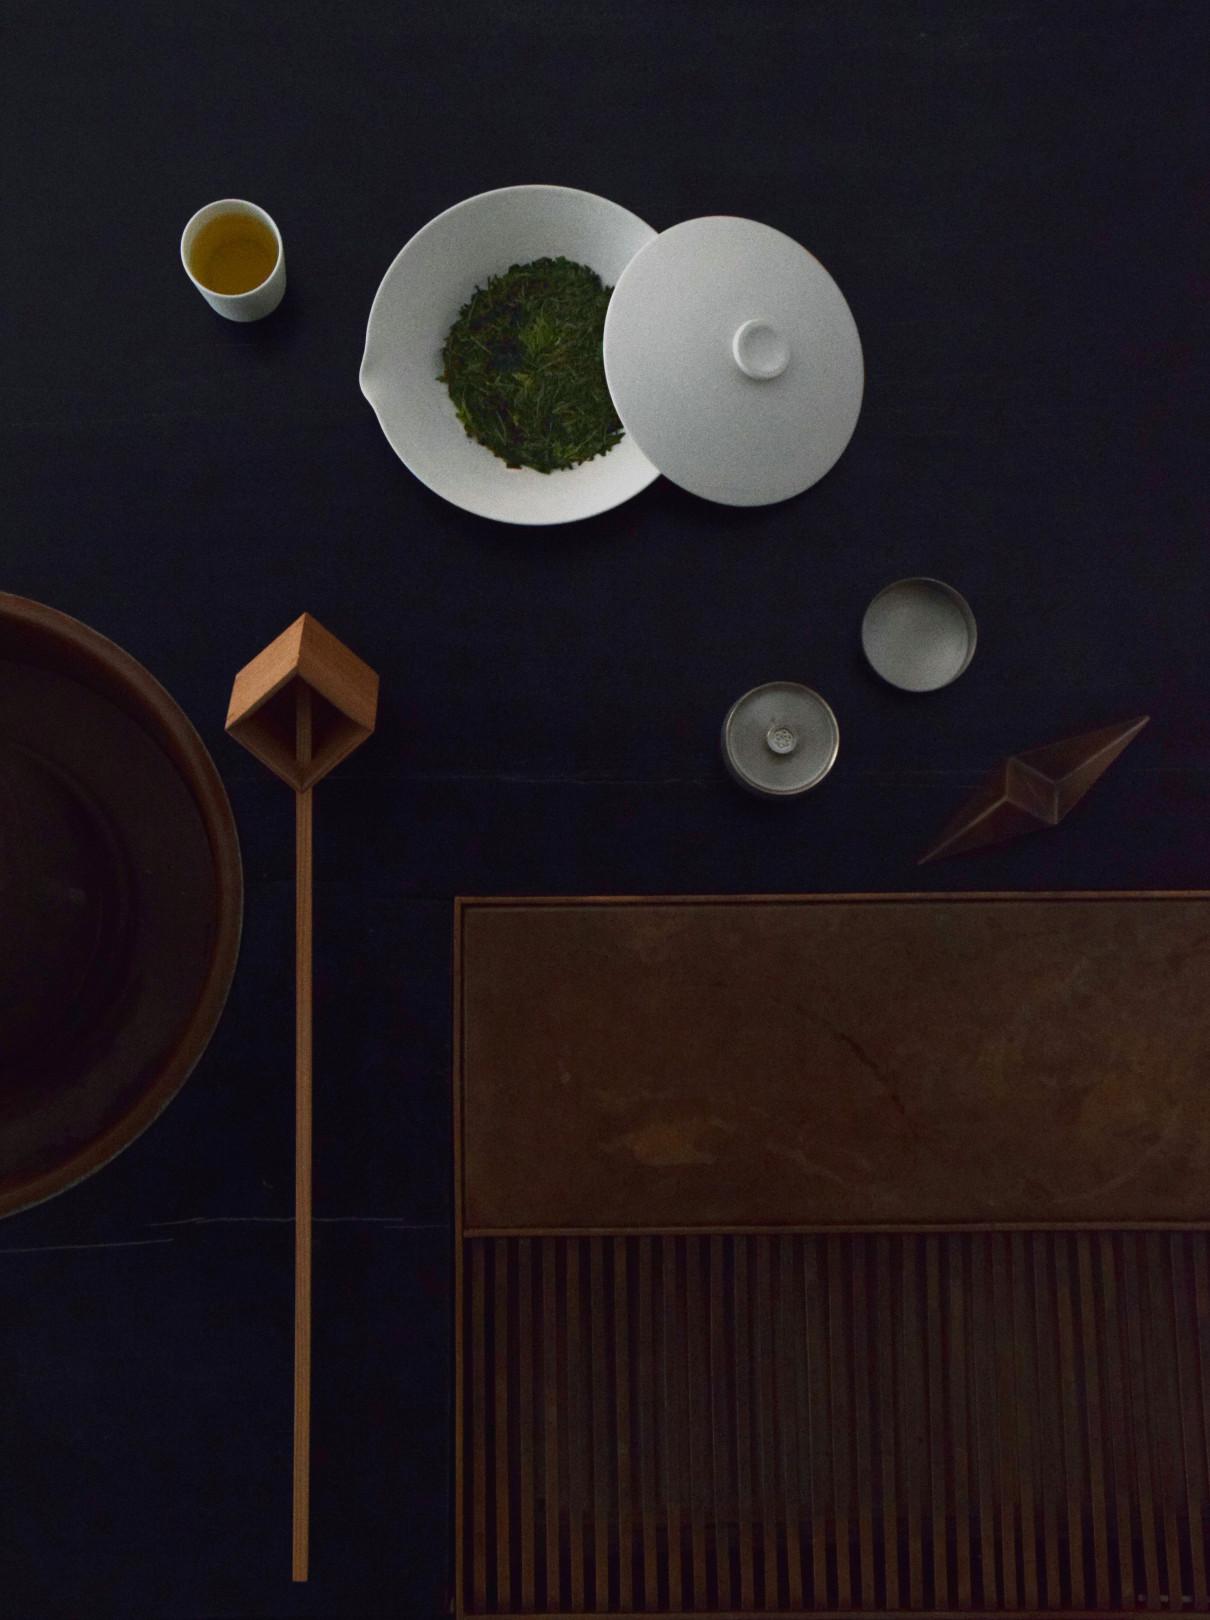 Sゝゝ[エス] 茶道具展 -茶の流儀 茶方會-